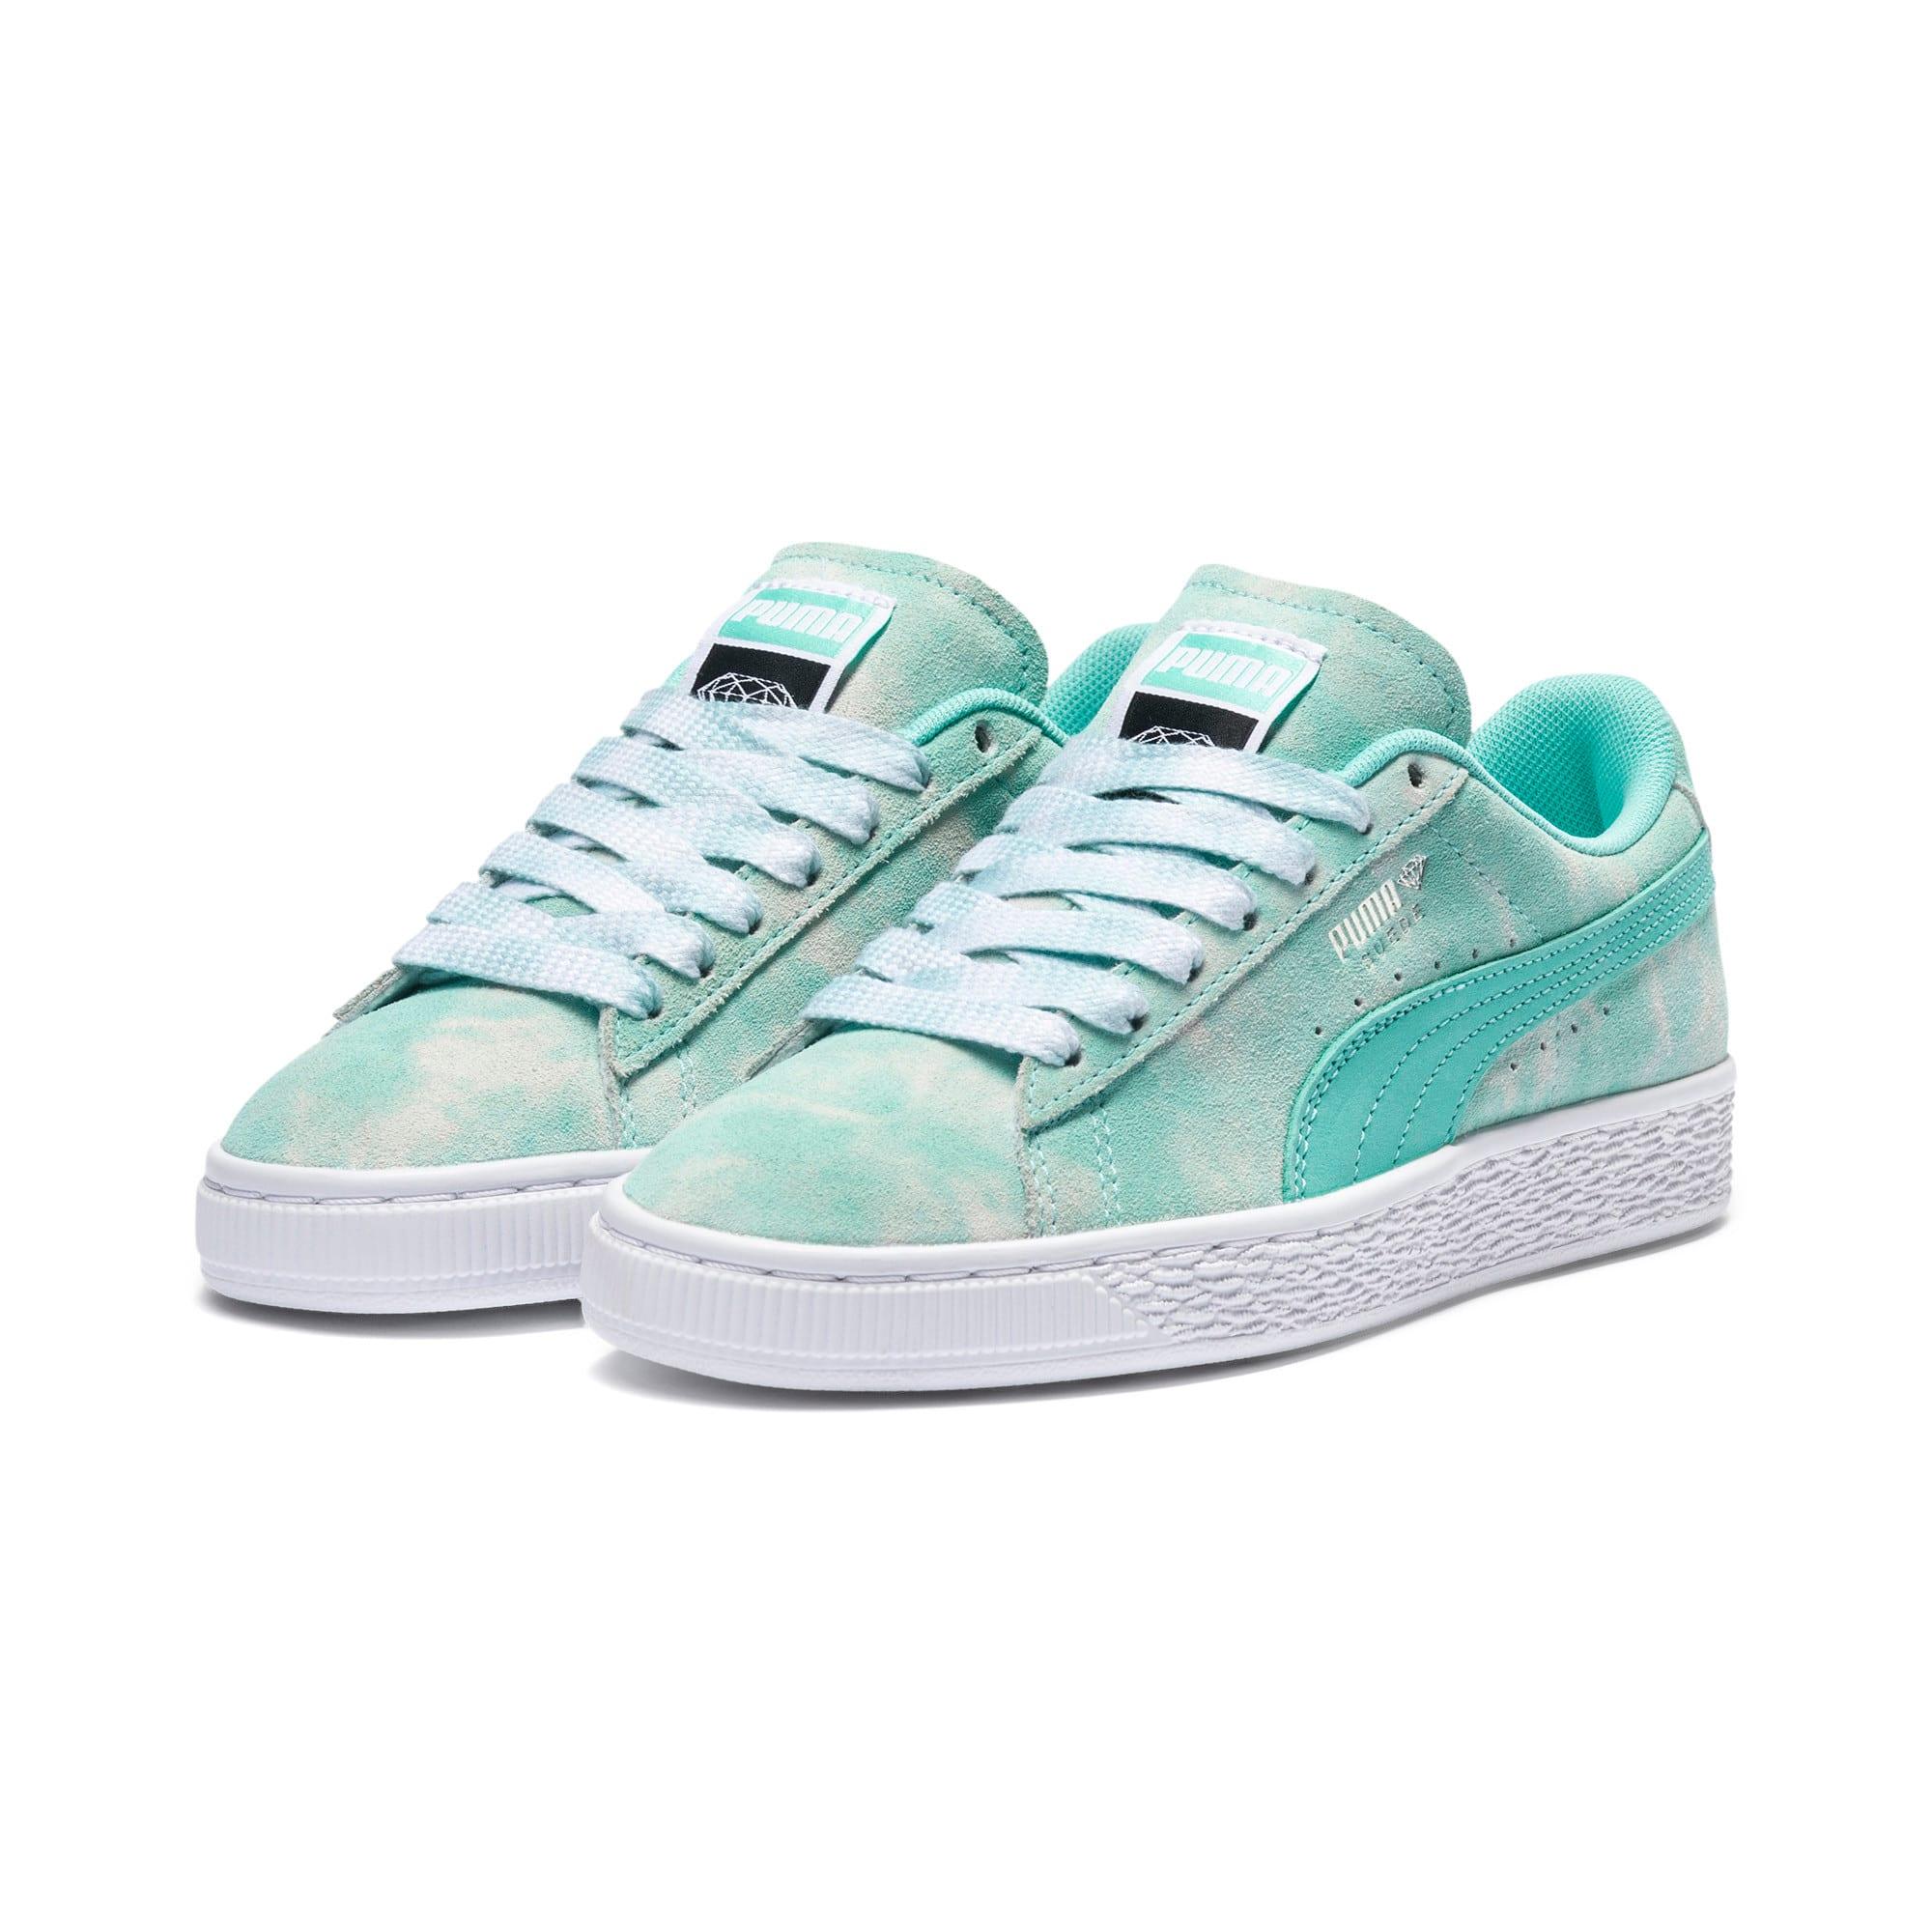 Miniatura 2 de Zapatos deportivosPUMA x DIAMOND SUPPLY CO. Suede JR, Diamond Blue-Diamond Blue, mediano